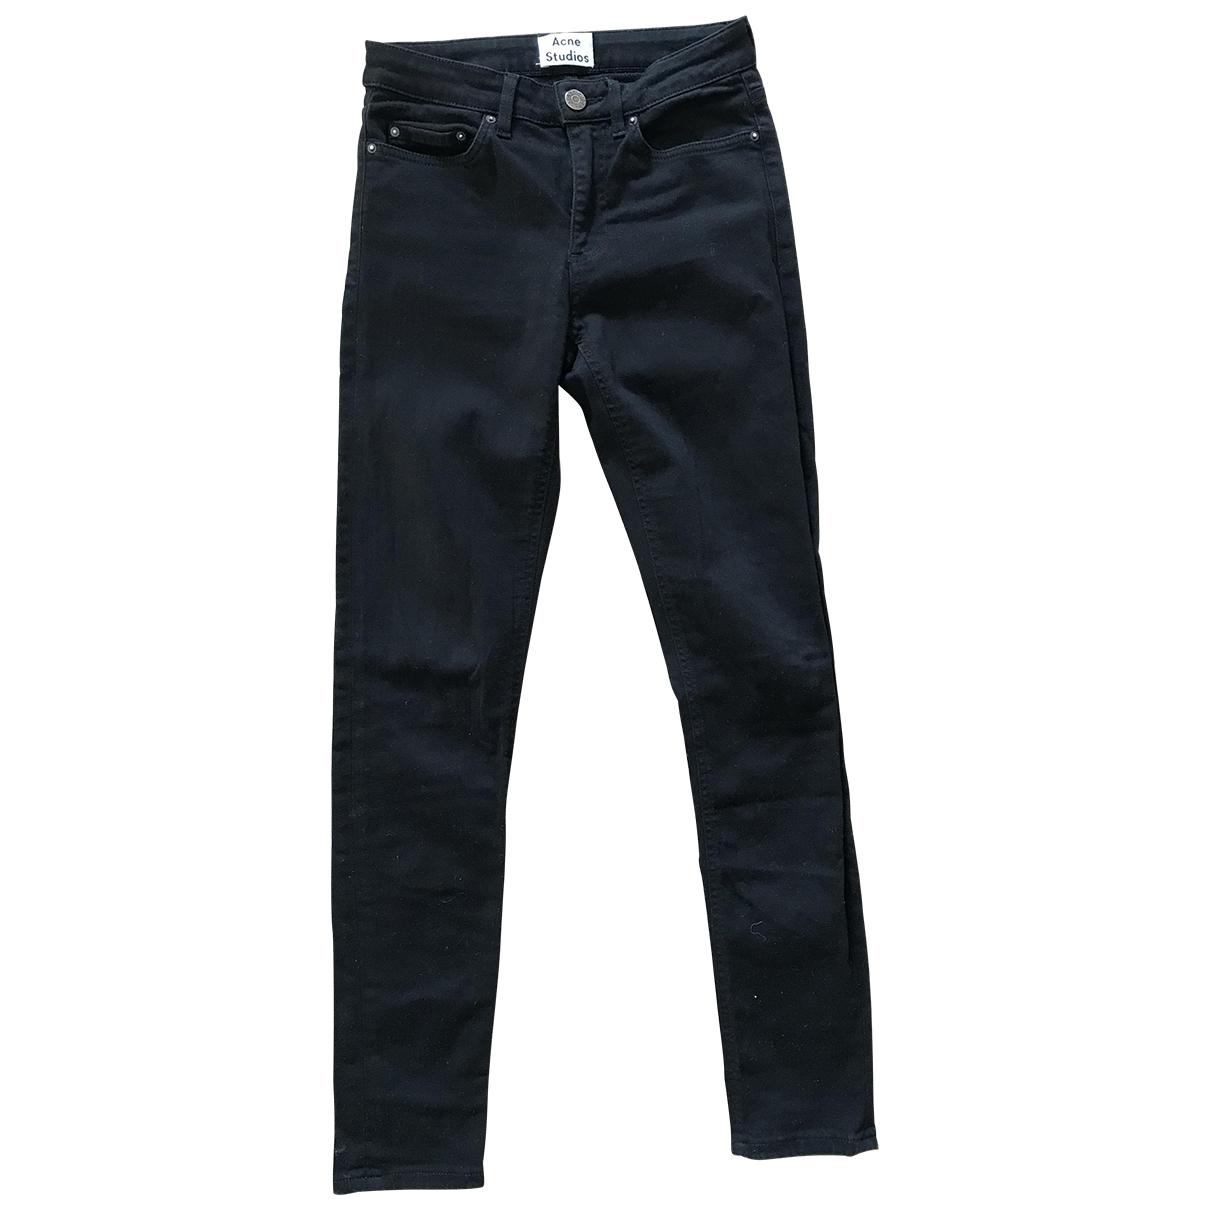 Acne Studios Skin 5 Black Cotton - elasthane Jeans for Women 25 US